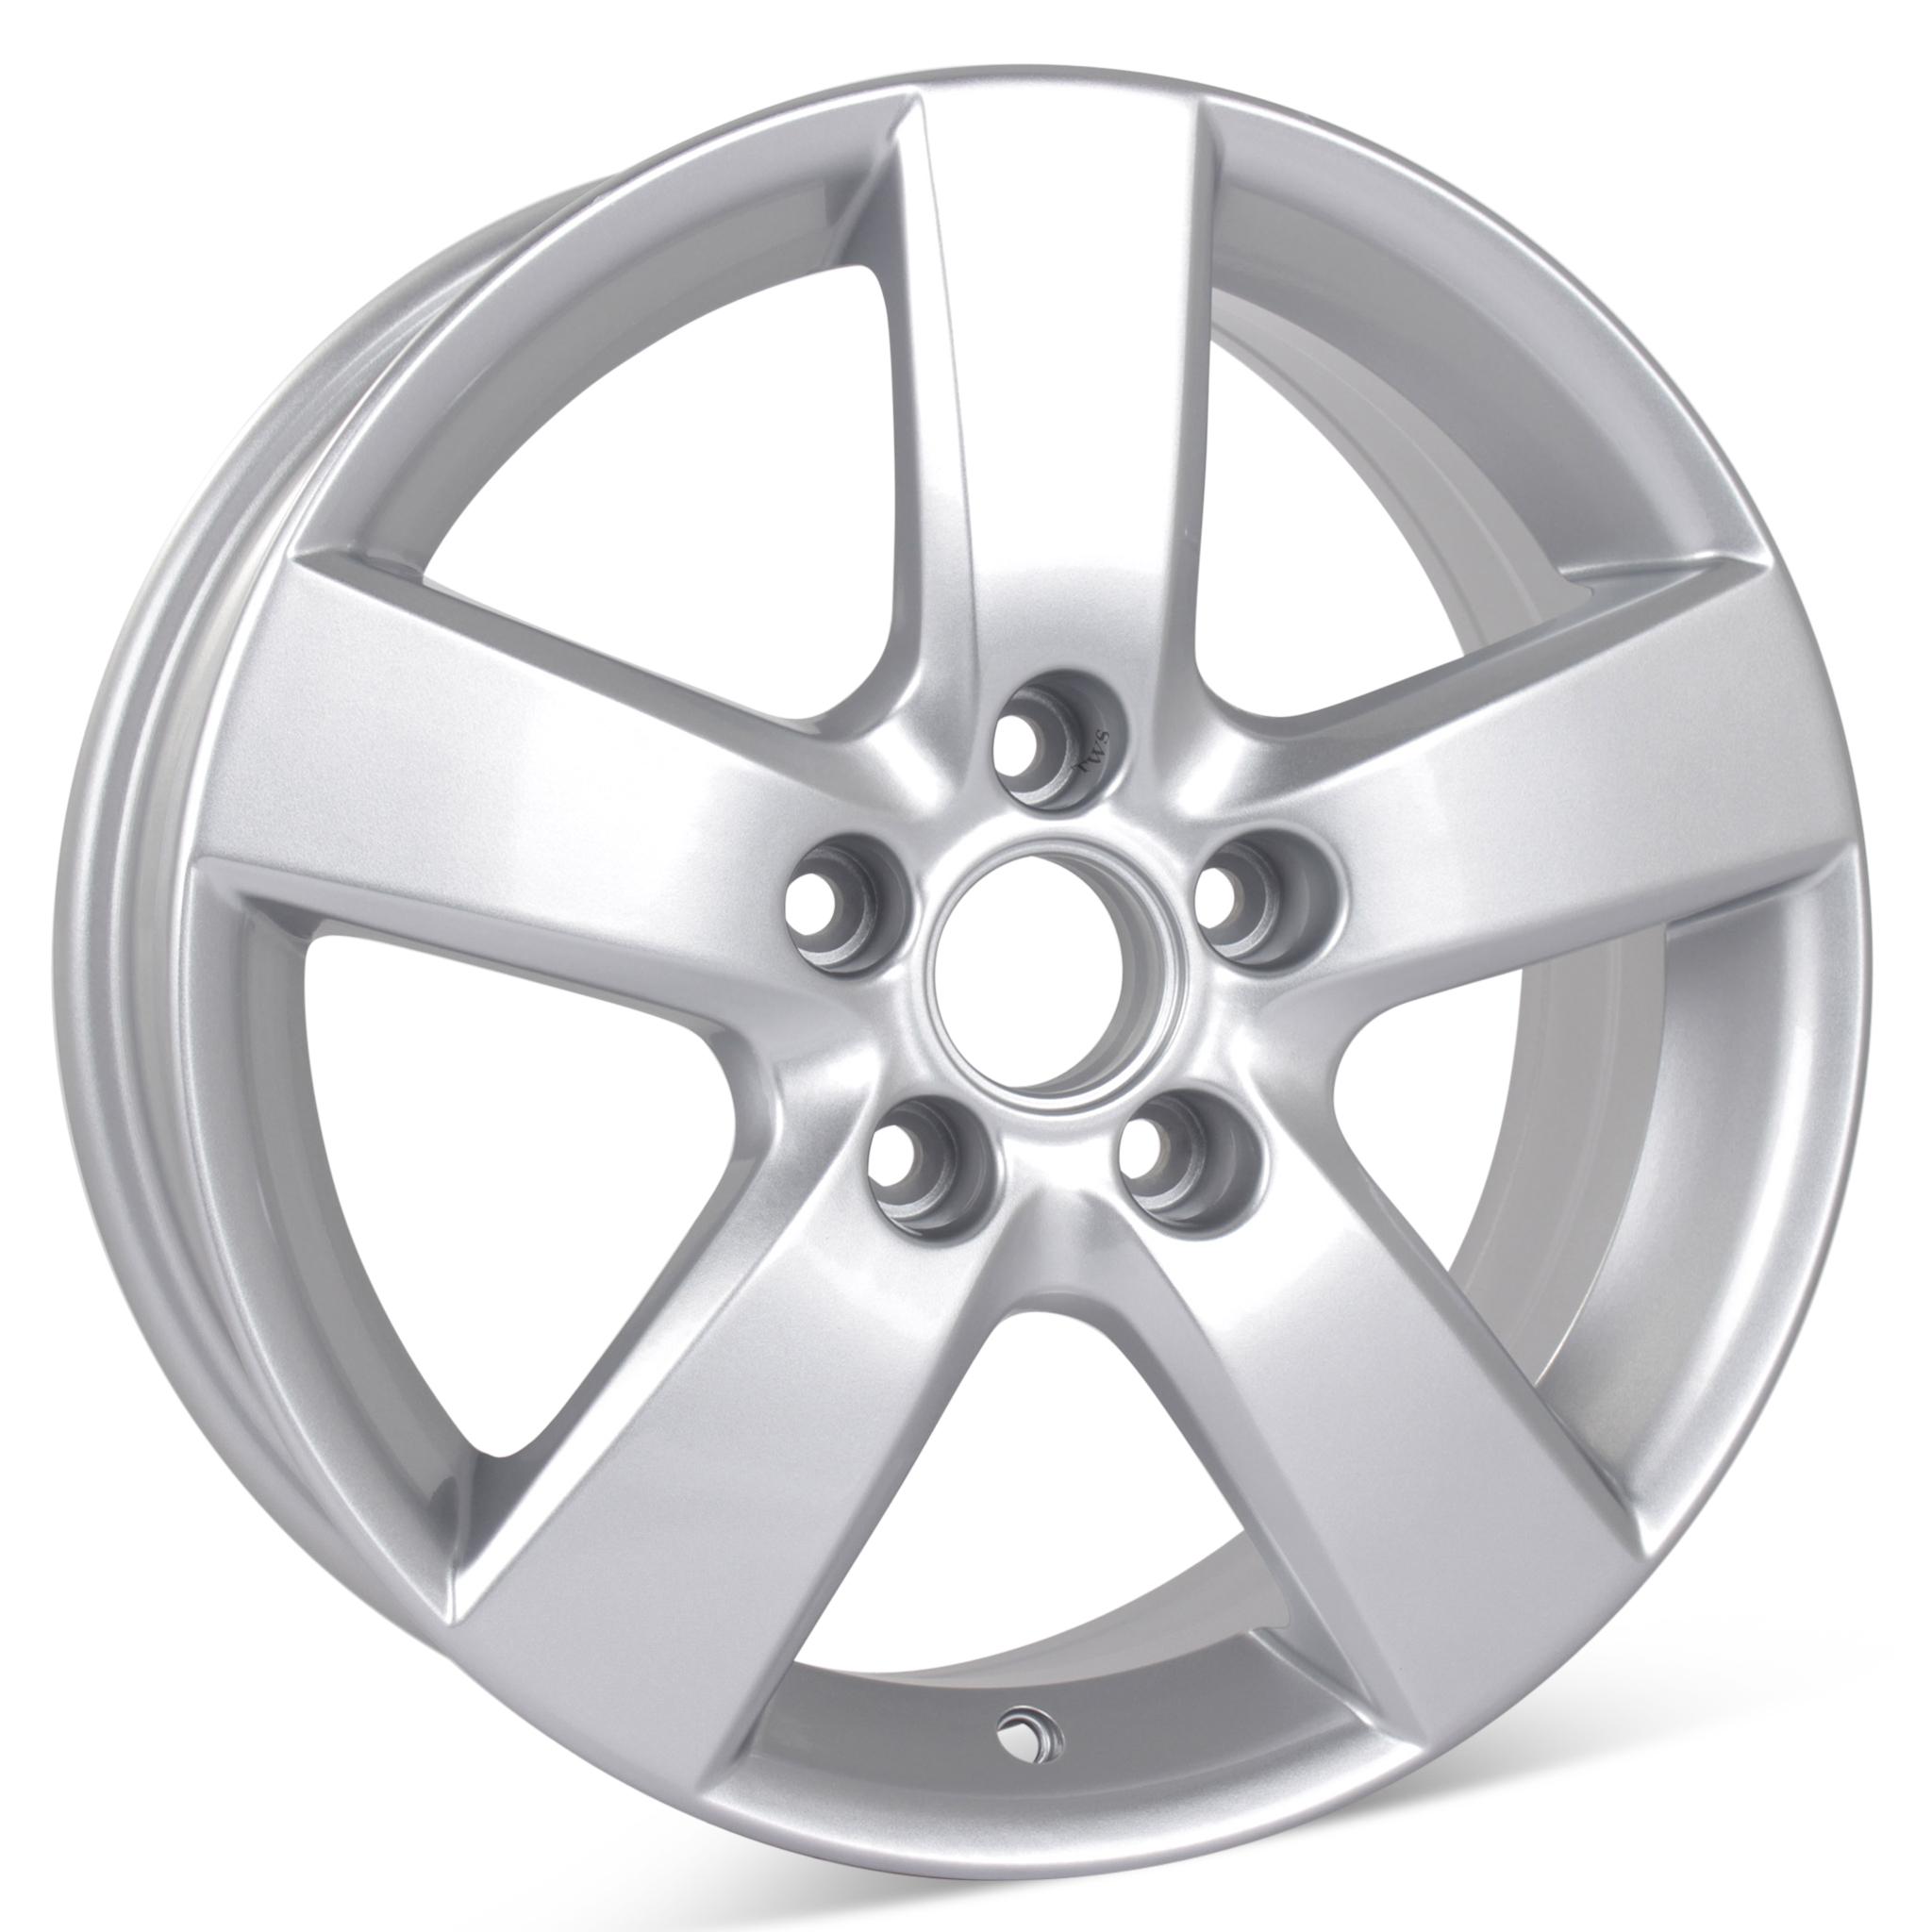 "New 16"" Alloy Replacement Wheel For Volkswagen Jetta 2008"